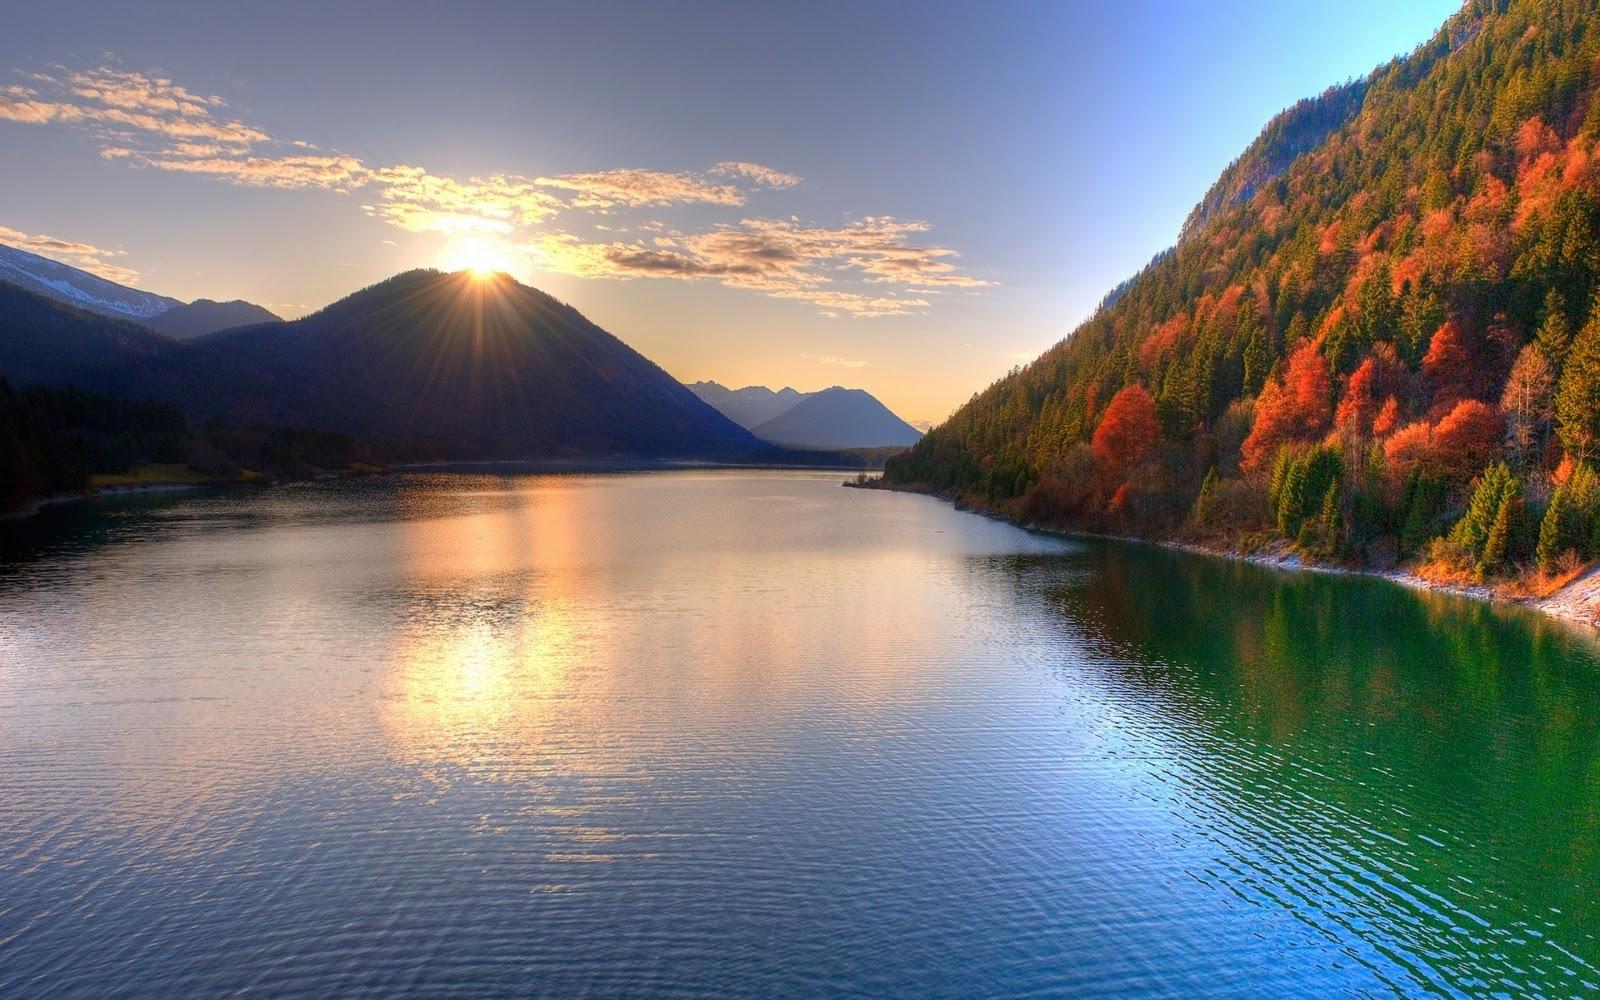 Good Wallpaper Mountain Water - Lakes+Mountains+Water+Scenery+Sunset+Wallpapers-4  Image_475474.jpg